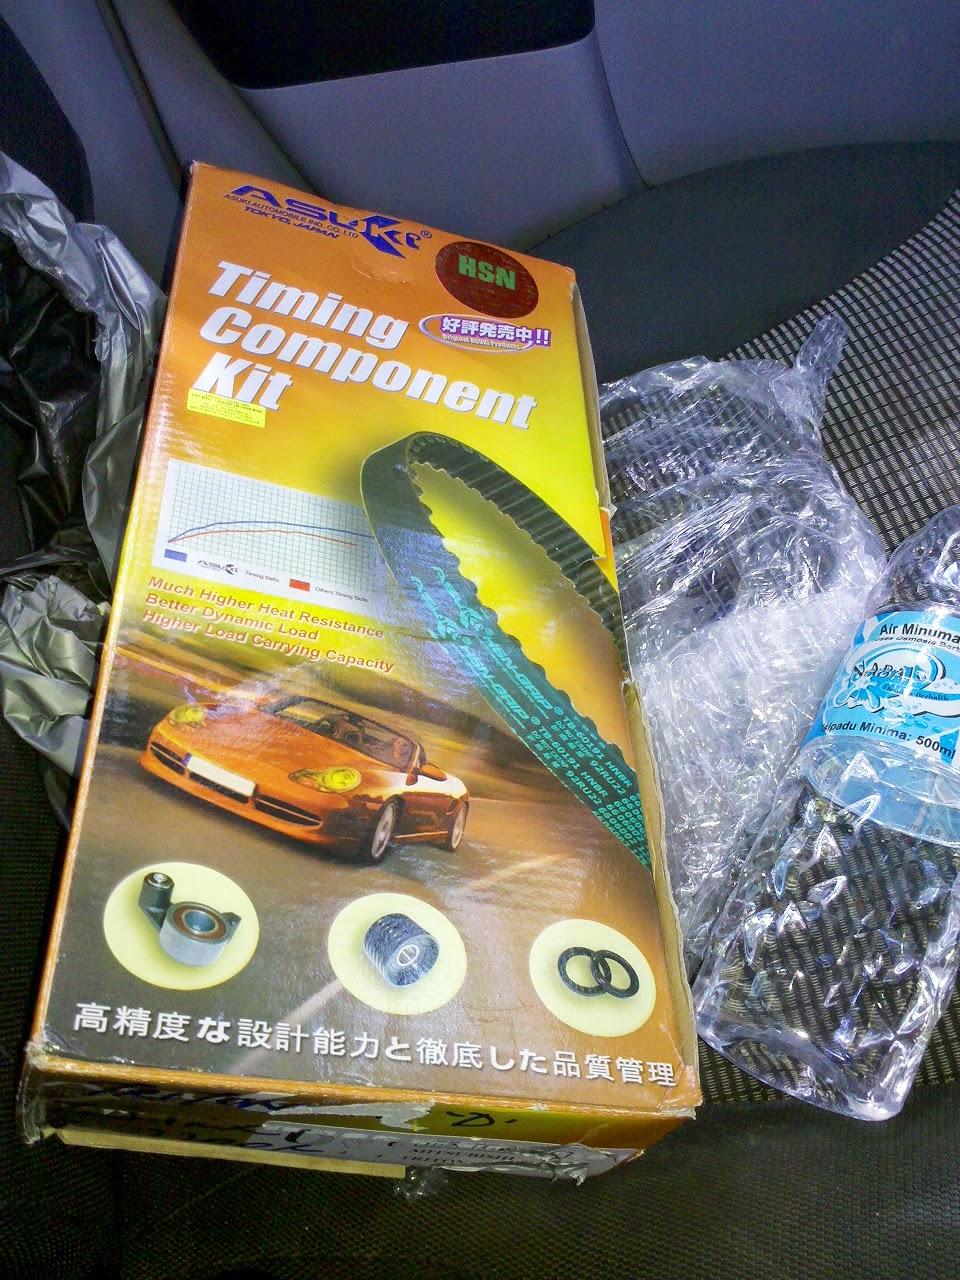 Masanya Aku Tukar Timing Belt Mitsubishi Triton Sendiri For Inilah Kotak Component Kit Yang Telah Saya Terima Pada 29mei2014 Jam 1000 Pagi Dan Collect Di Pejabat Pos Daerah Ranau